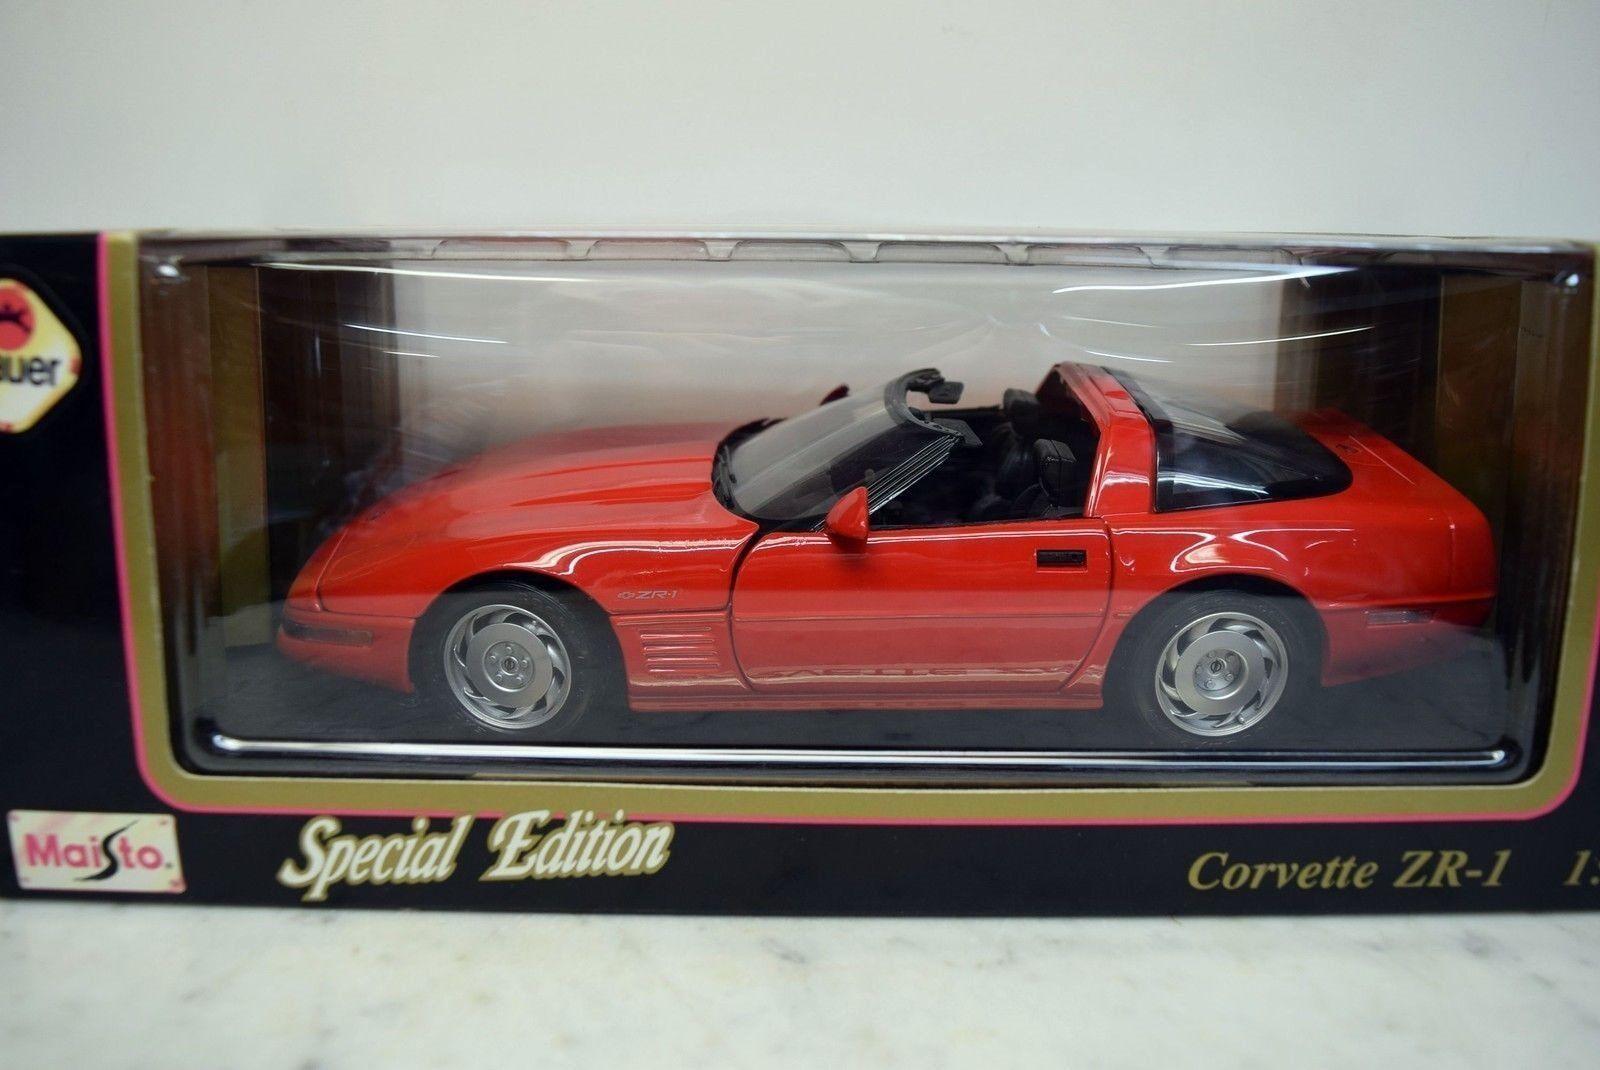 1 18 Maisto Chevy Corvette '92 ZR-1 Congreenible red, bluee